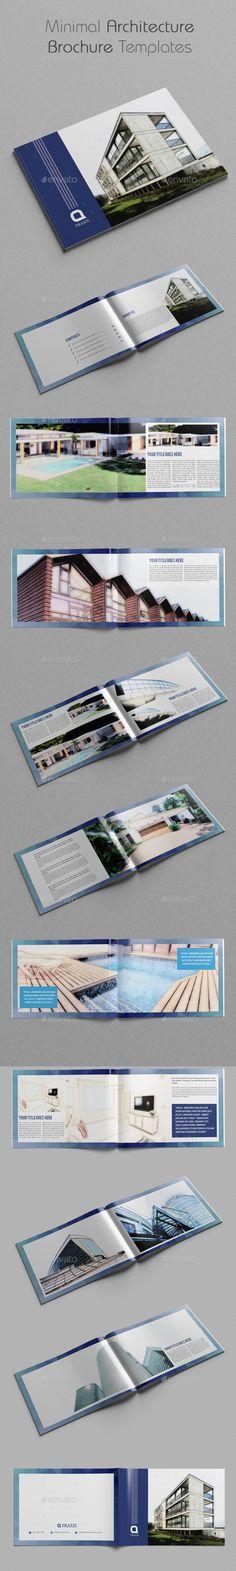 Architecture Brochure Template VerIi  Architecture Brochure